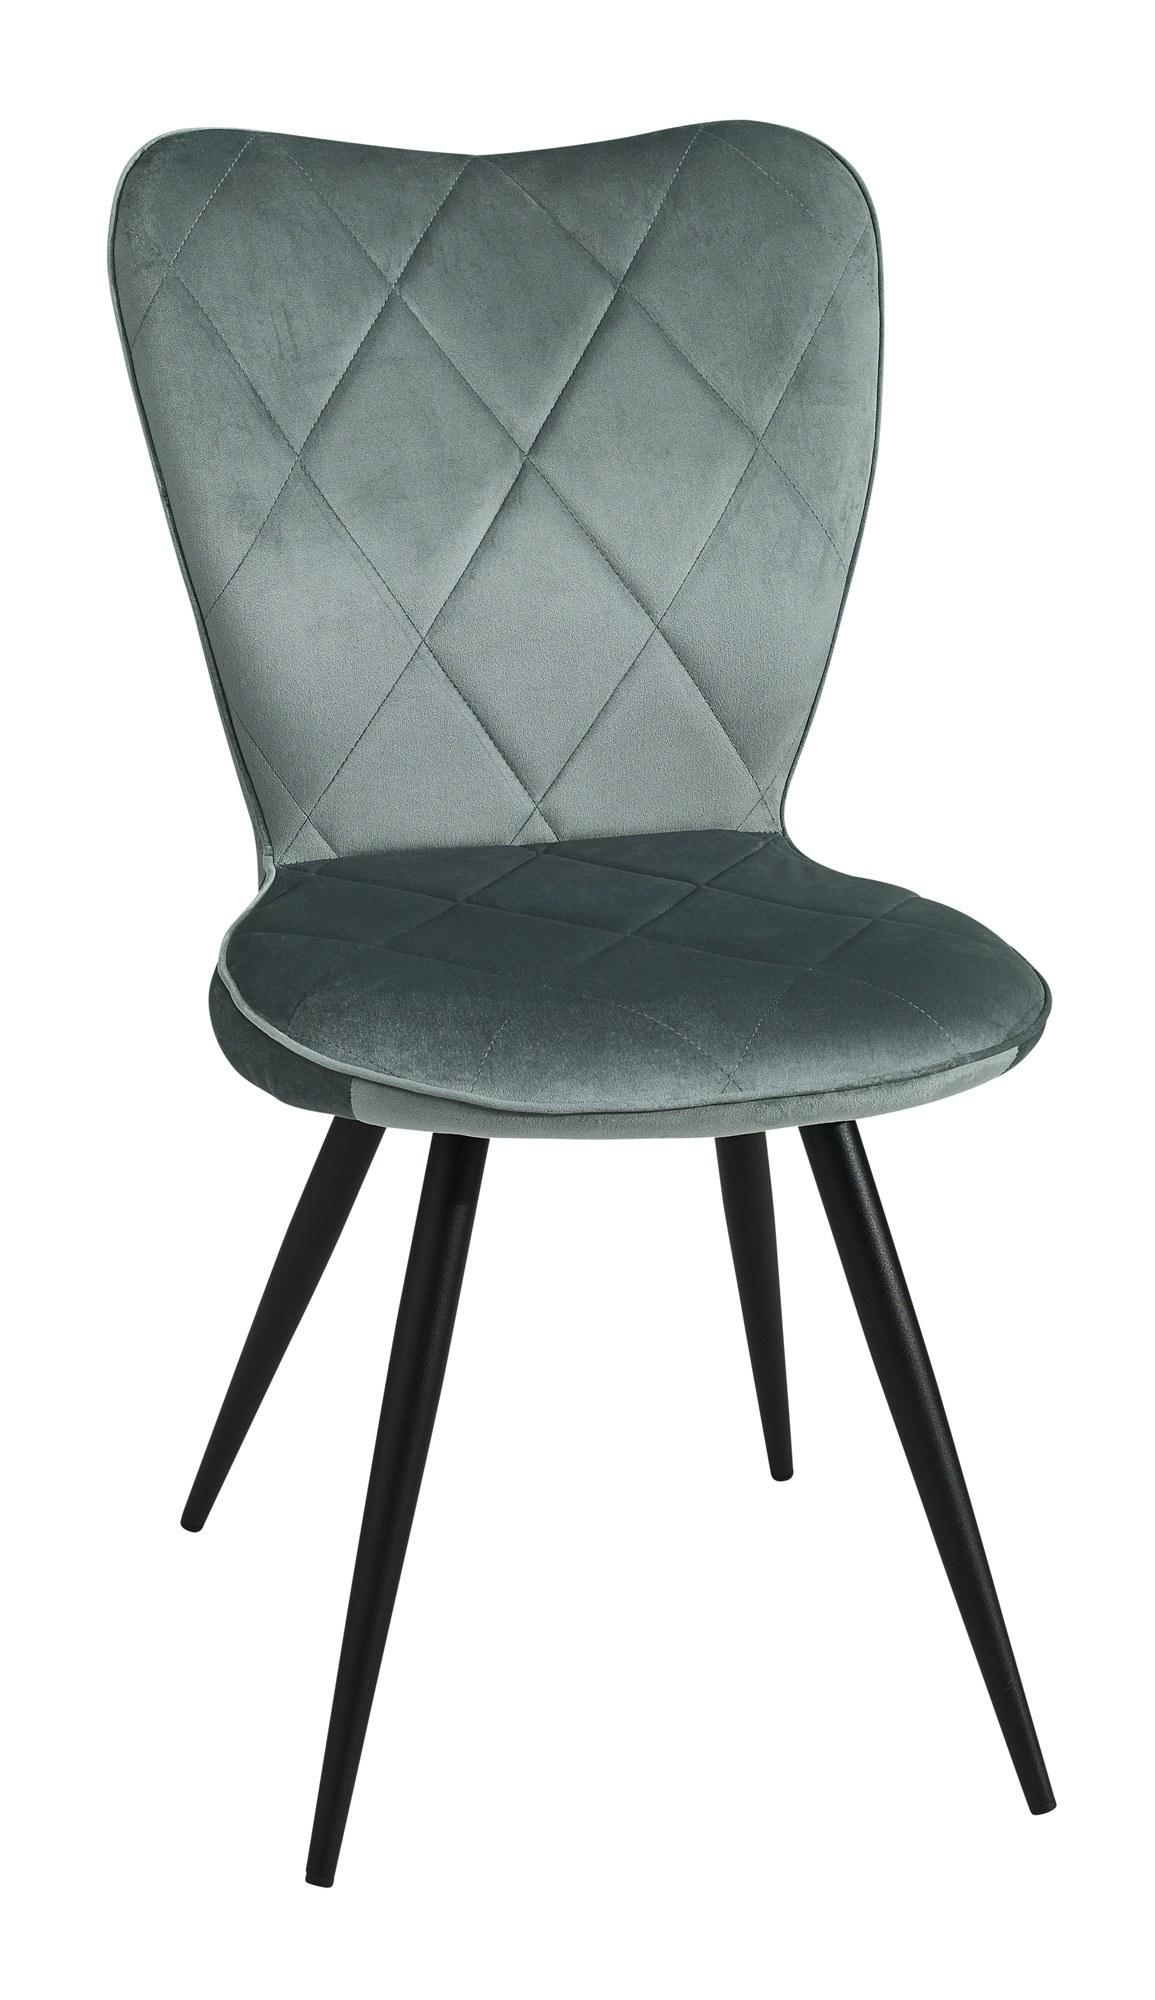 chaise séraphine velour pied noir